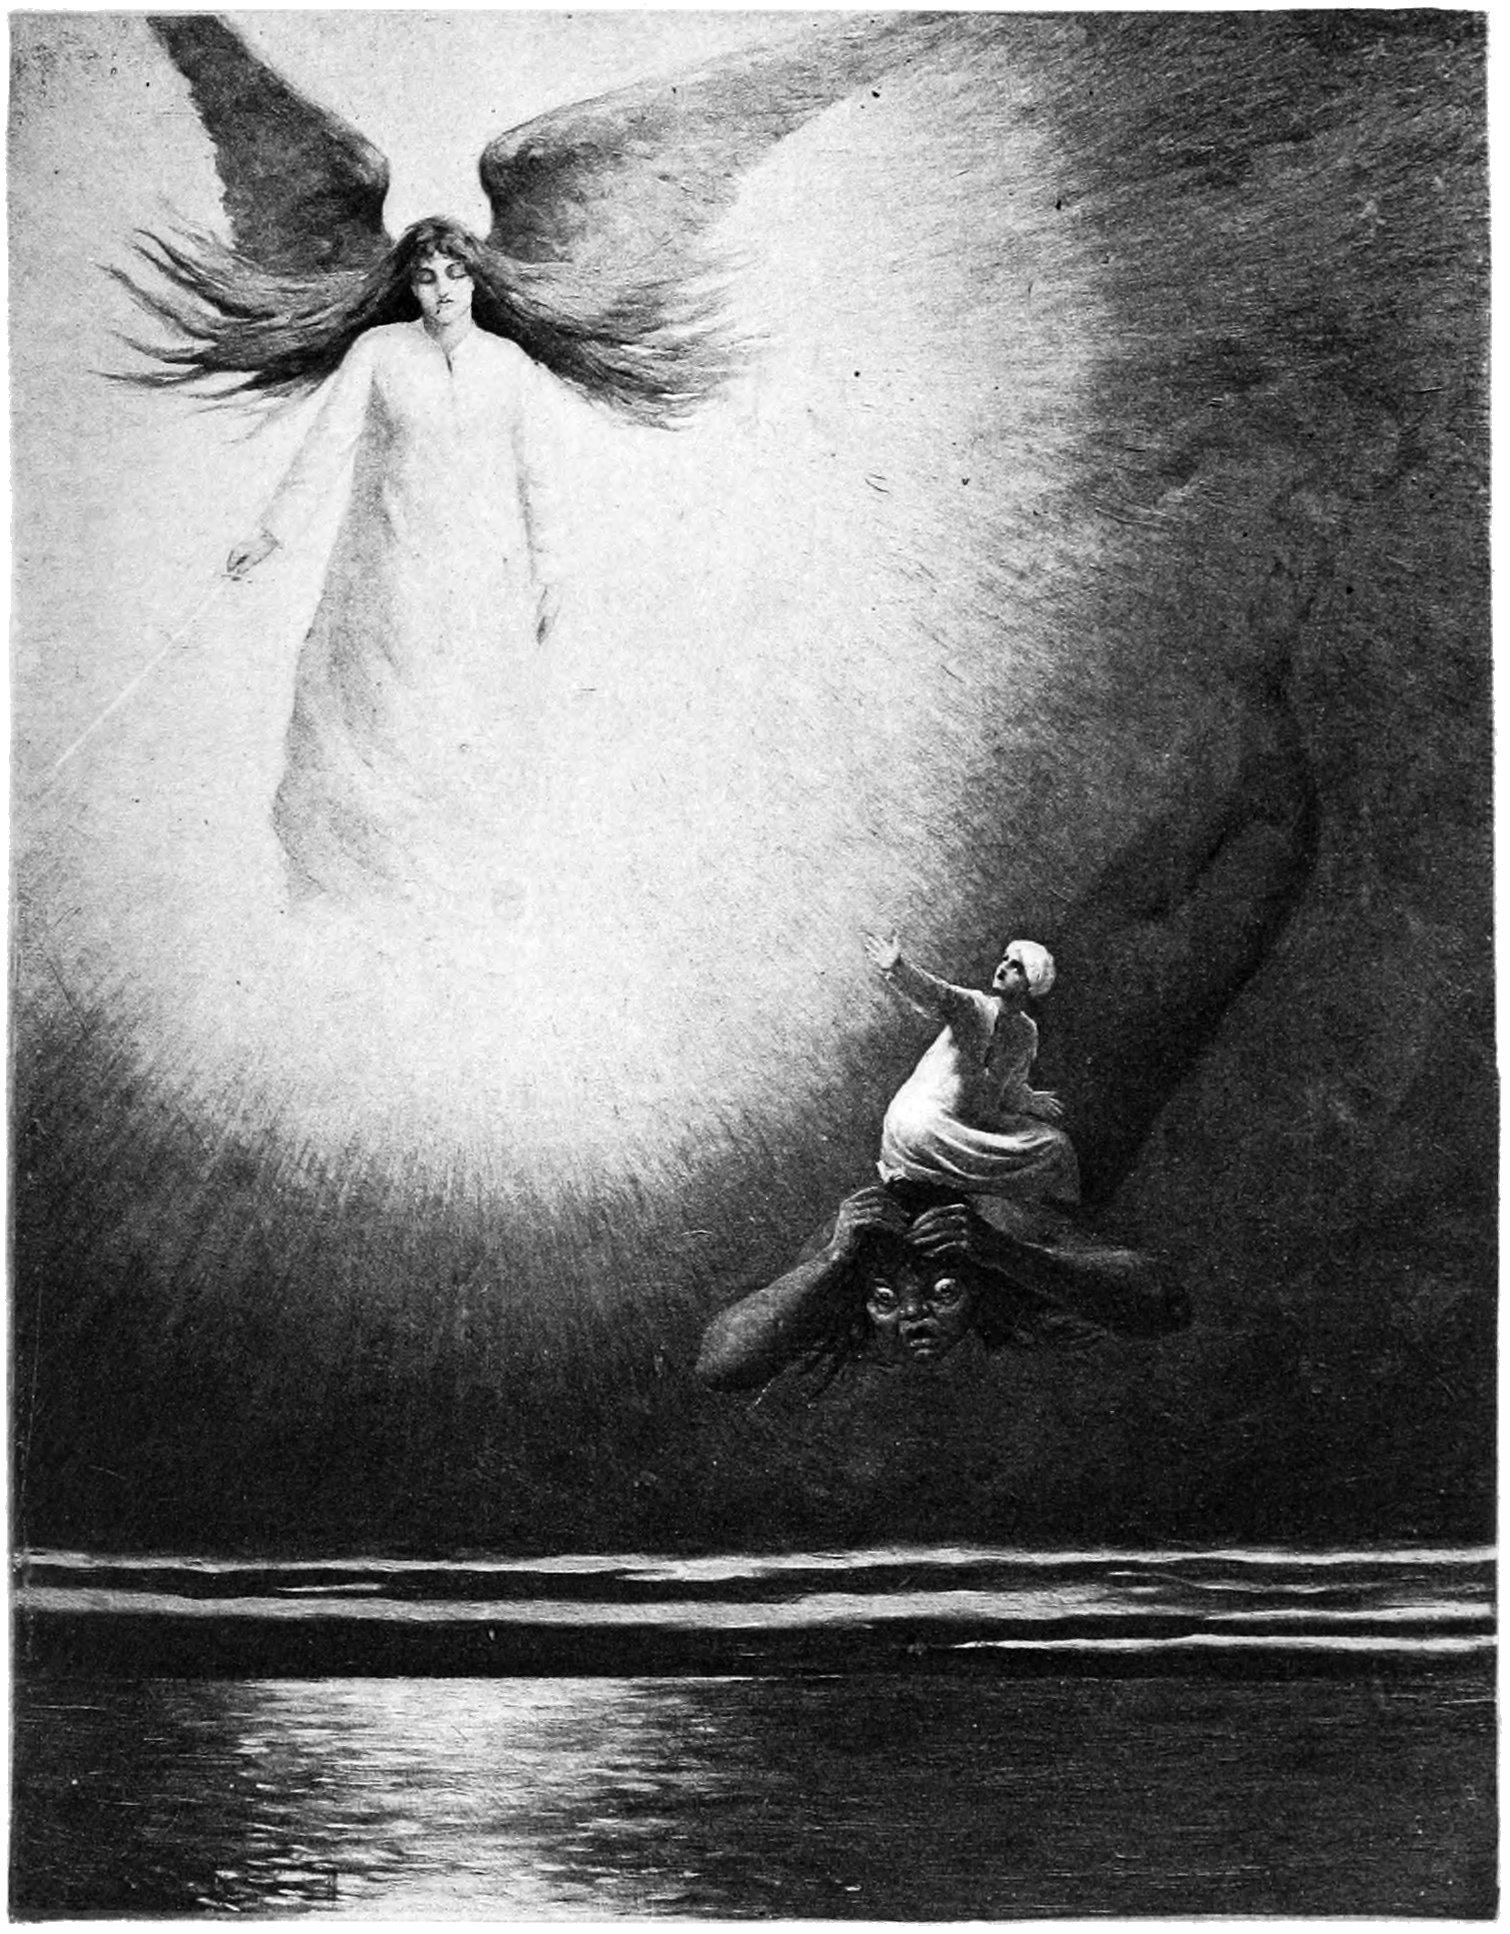 Abu Muhammed the Slaggard - Illustration by Albert Letchford